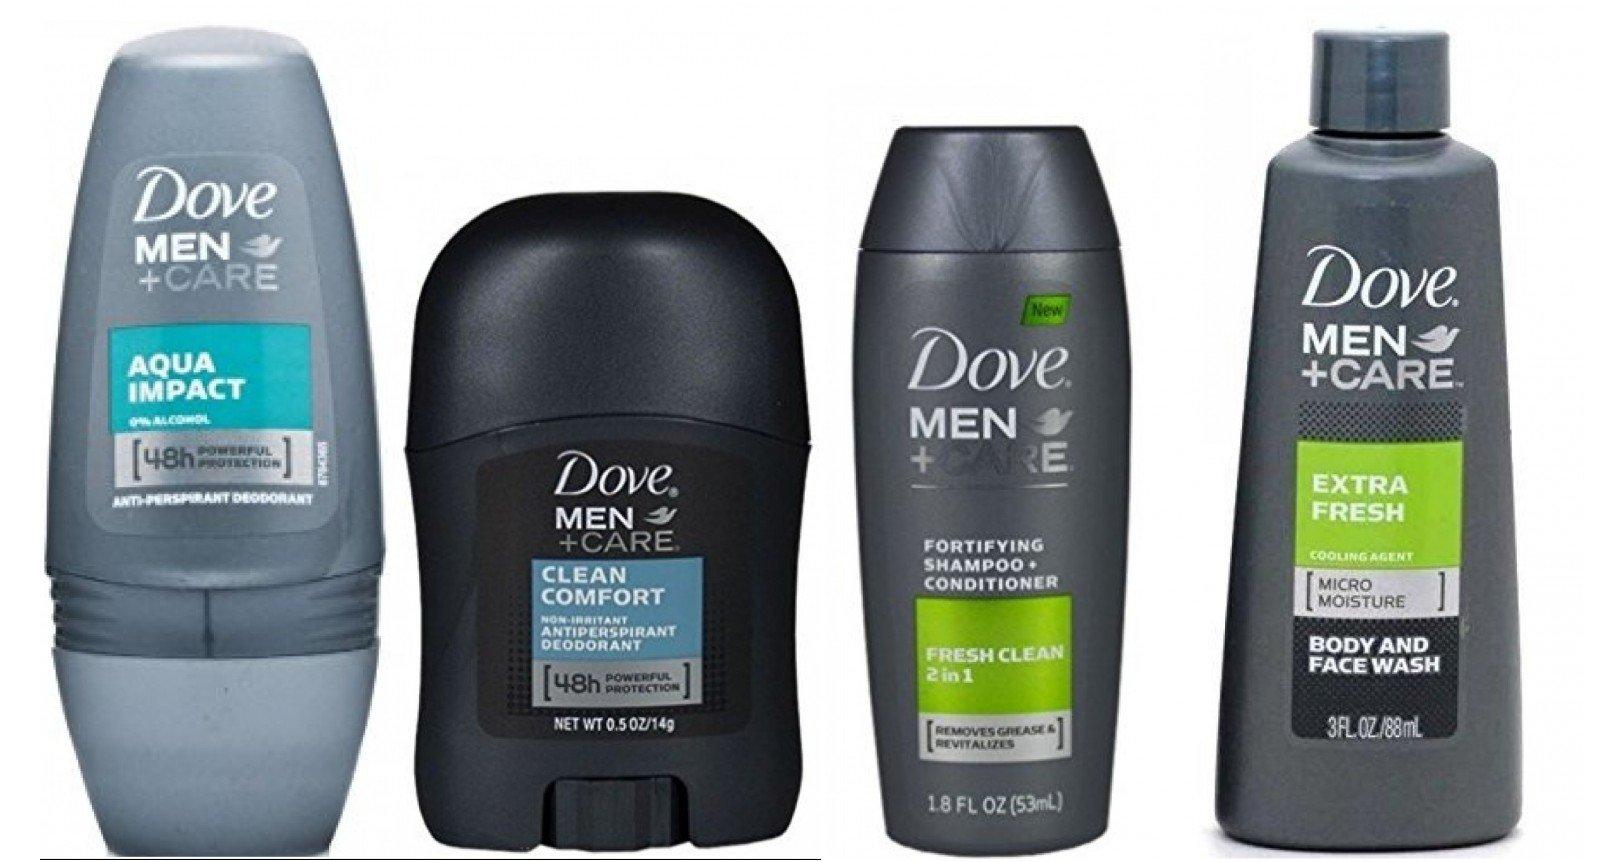 Buy Dove Mens Deodorant Body Wash Extra Fresh Aqua Impact Roll On 2 In 1 Shampoo Conditioner Travel Size In Cheap Price On Alibaba Com